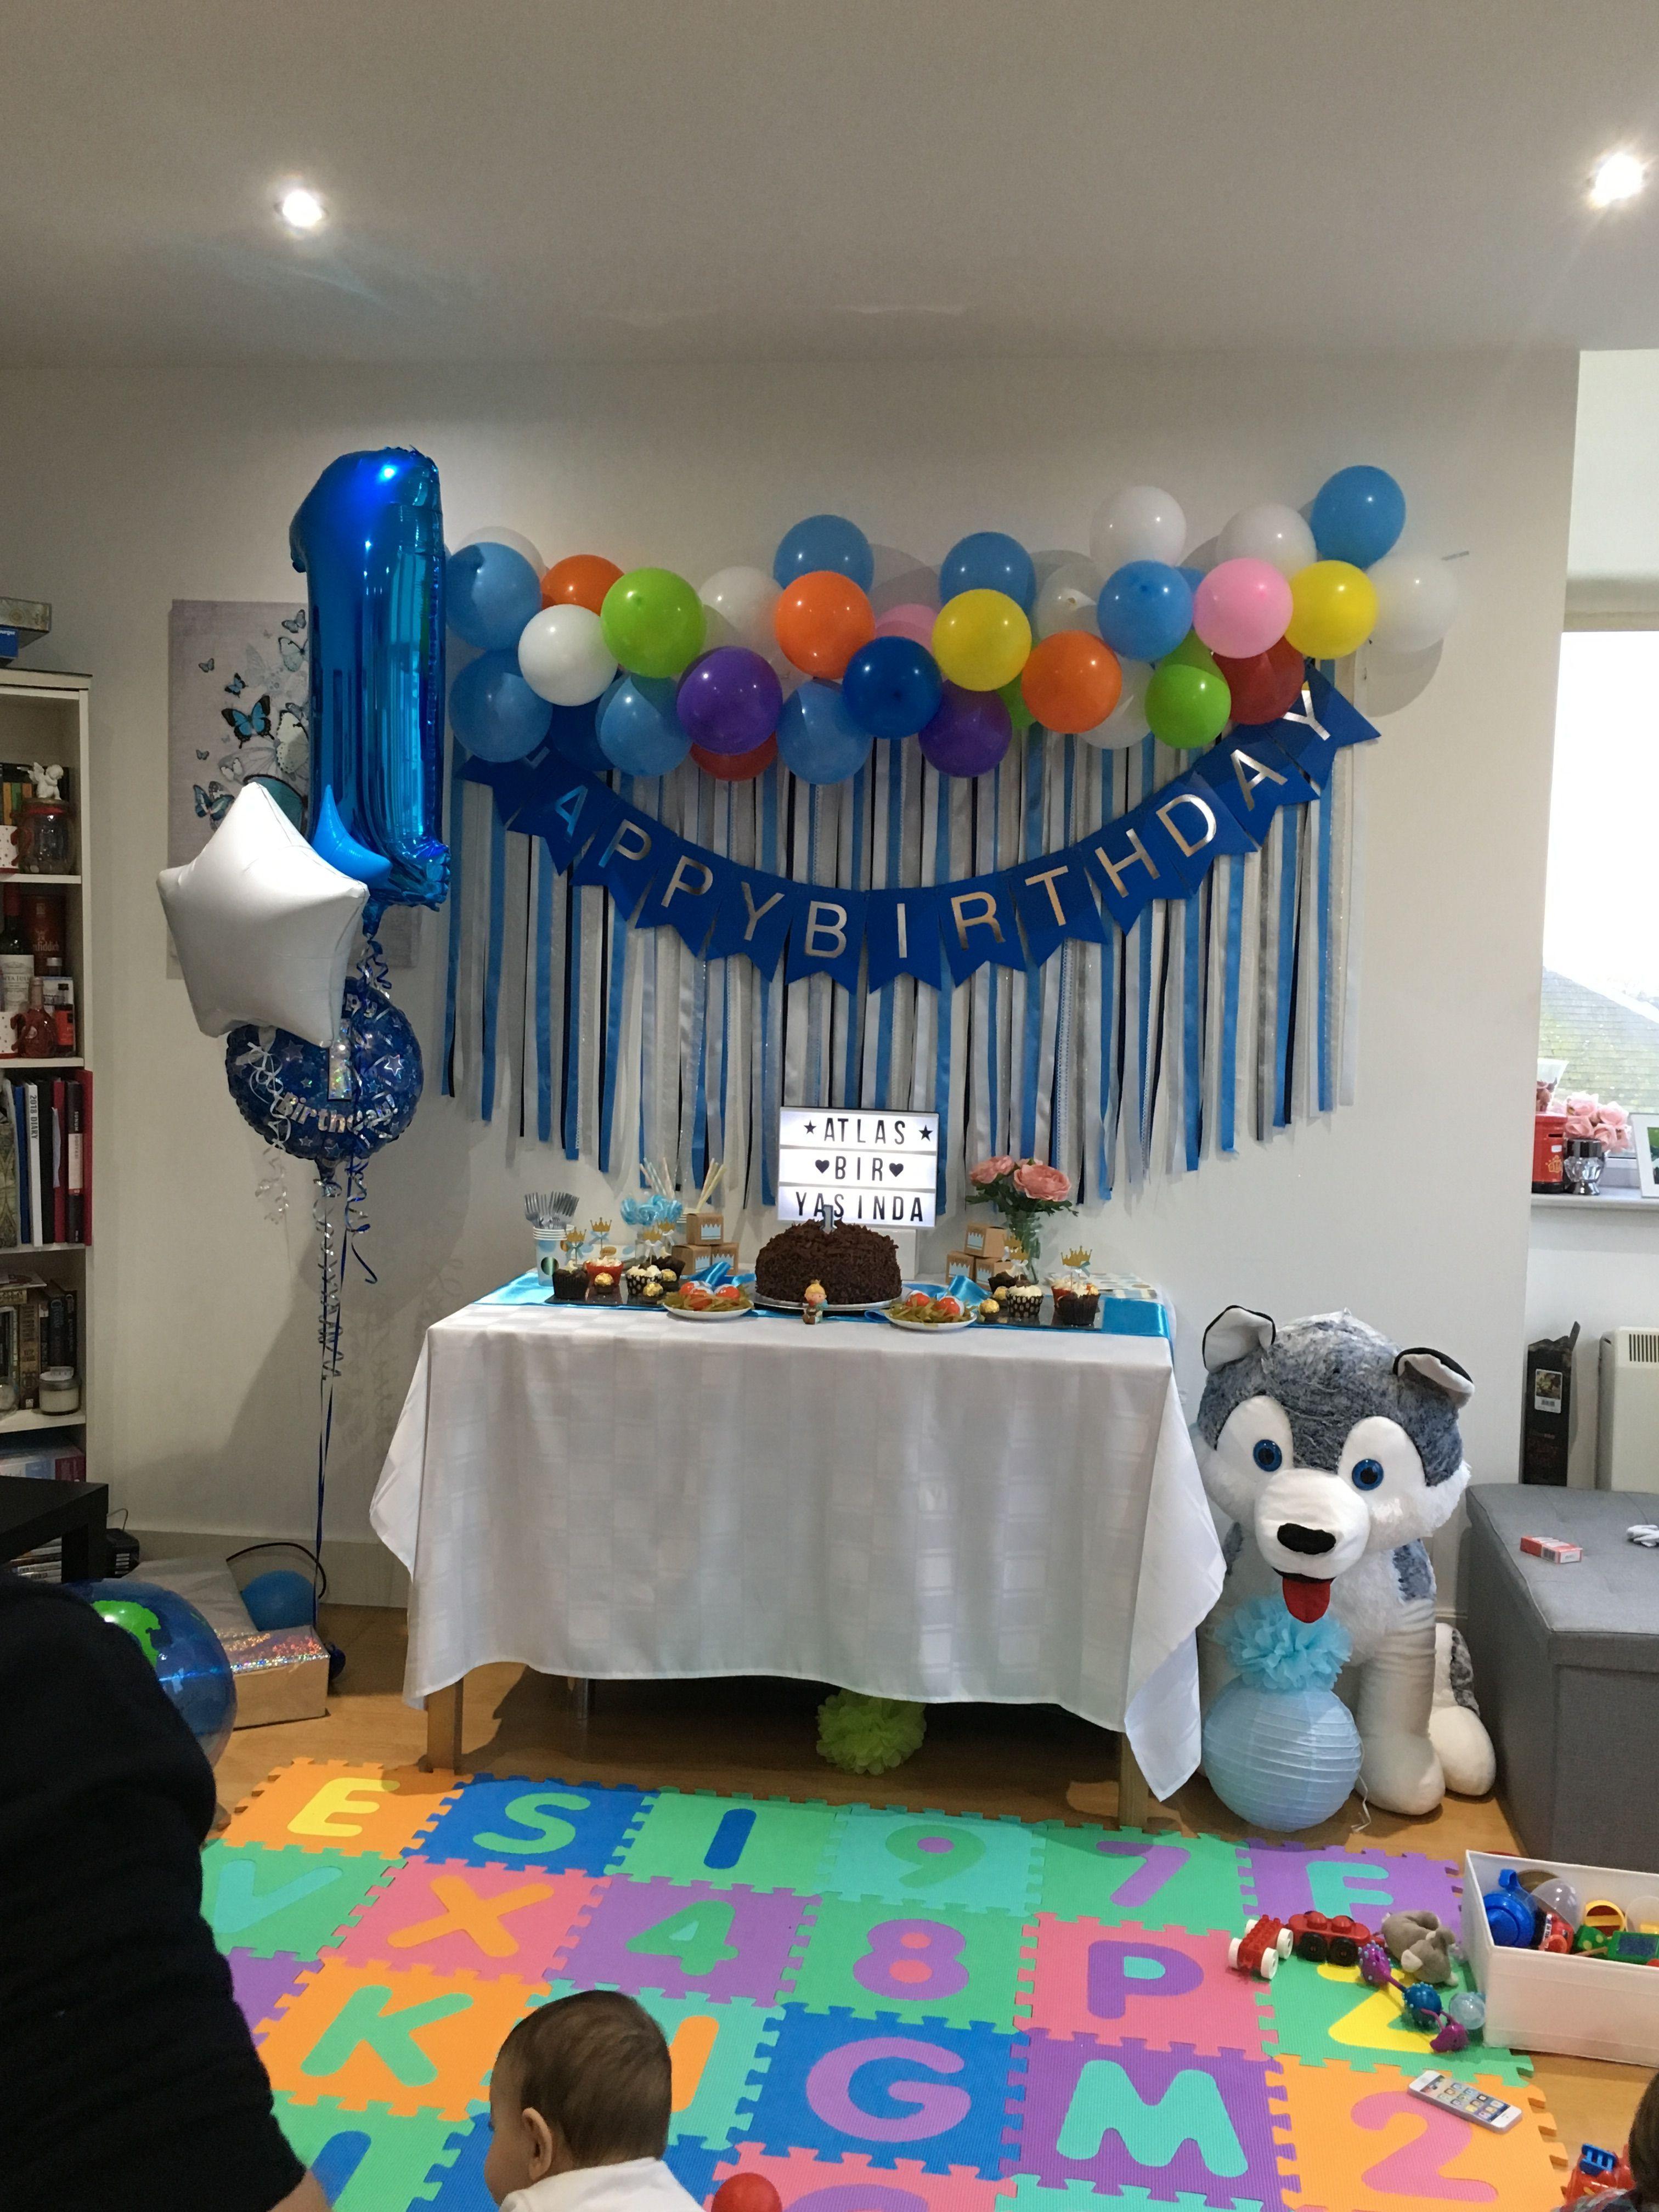 Atlas S First Birthday Birthday Firstbirthday Decoration Decorati Cake Table Decorations Birthday Birthday Table Decorations Birthday Decorations